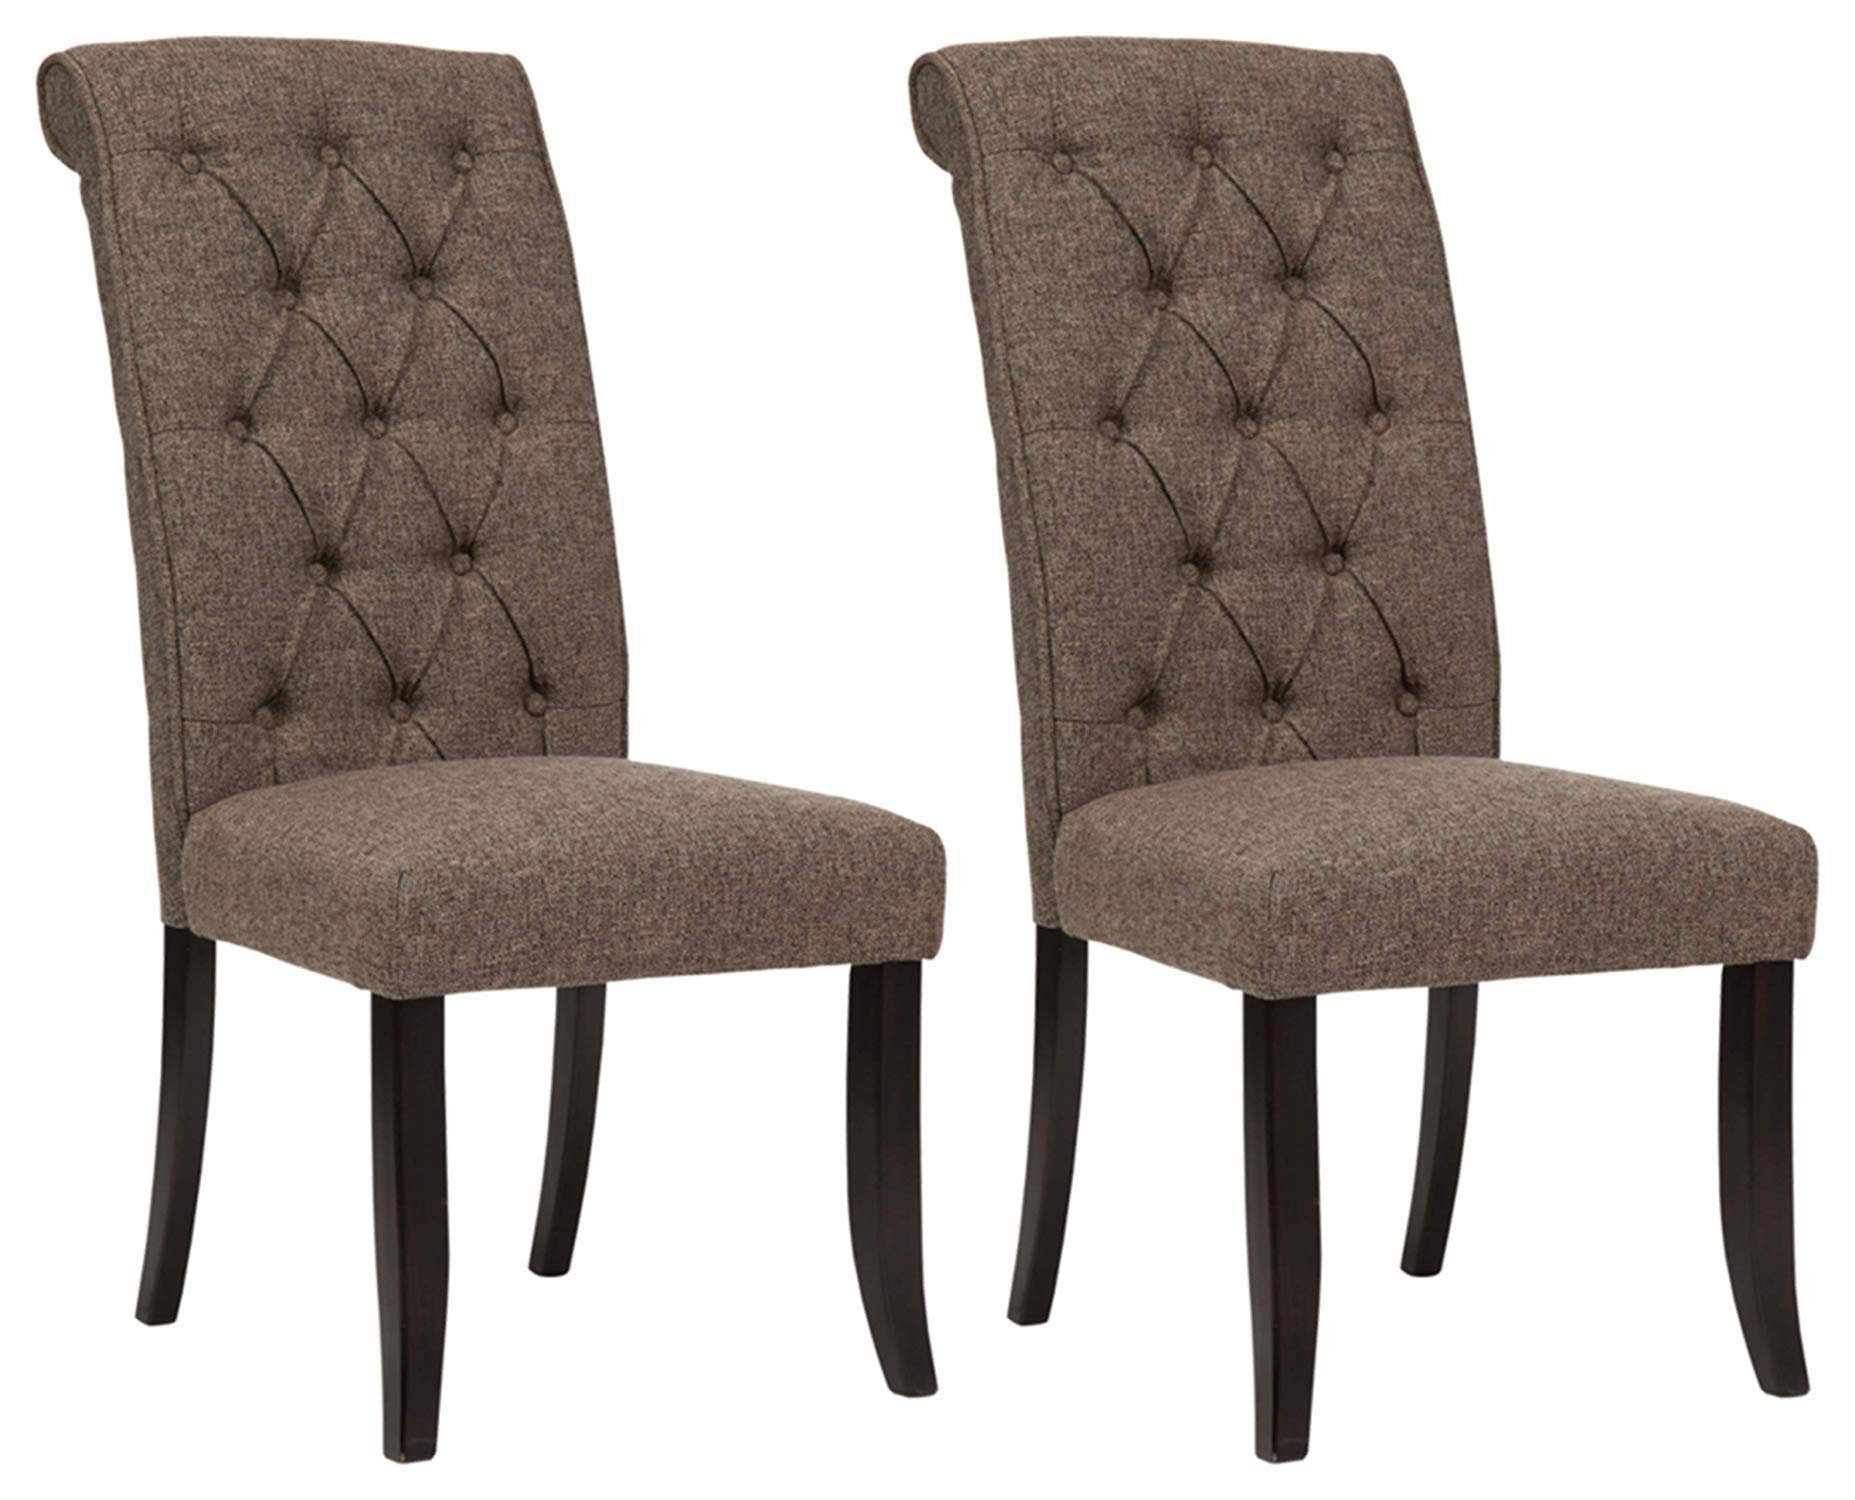 Ashley Furniture Signature Design - Tripton Dining Room Side Chair Set - Upholstered - Vintage Casual - Set of 2 - Graphite